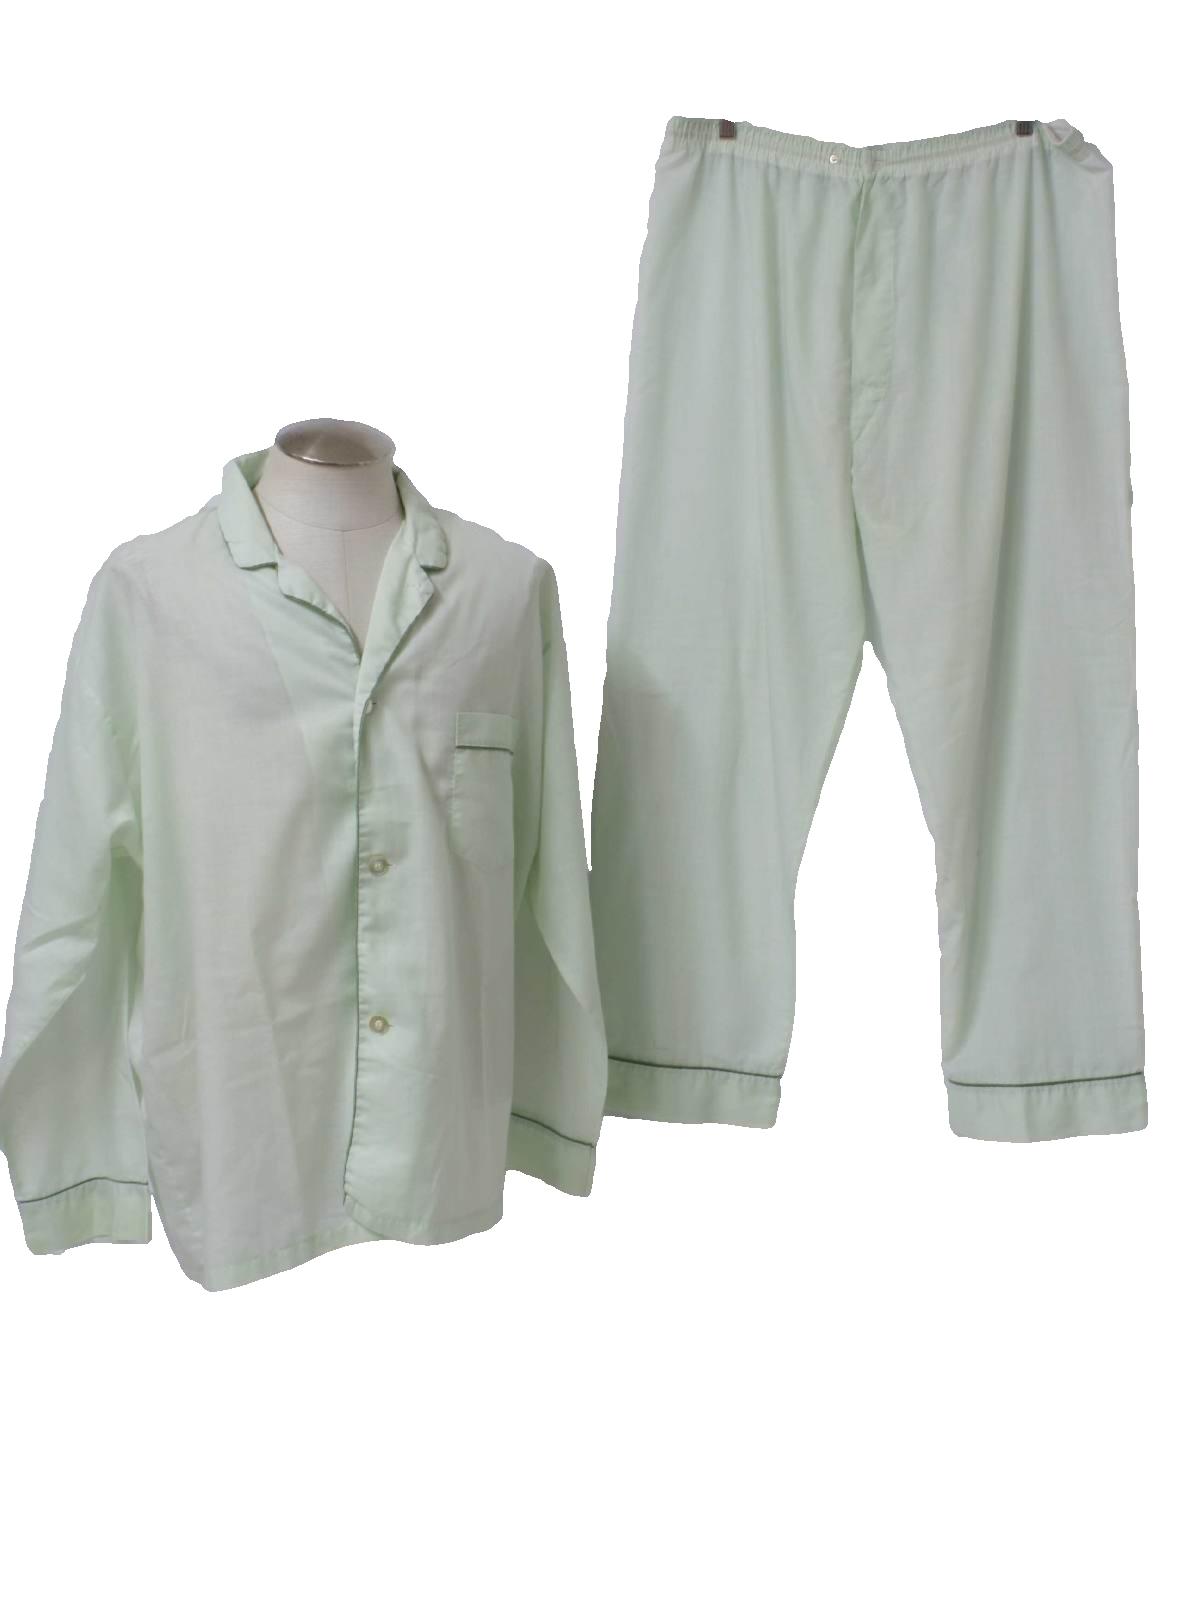 Mens Two Piece Pajamas Breeze Clothing